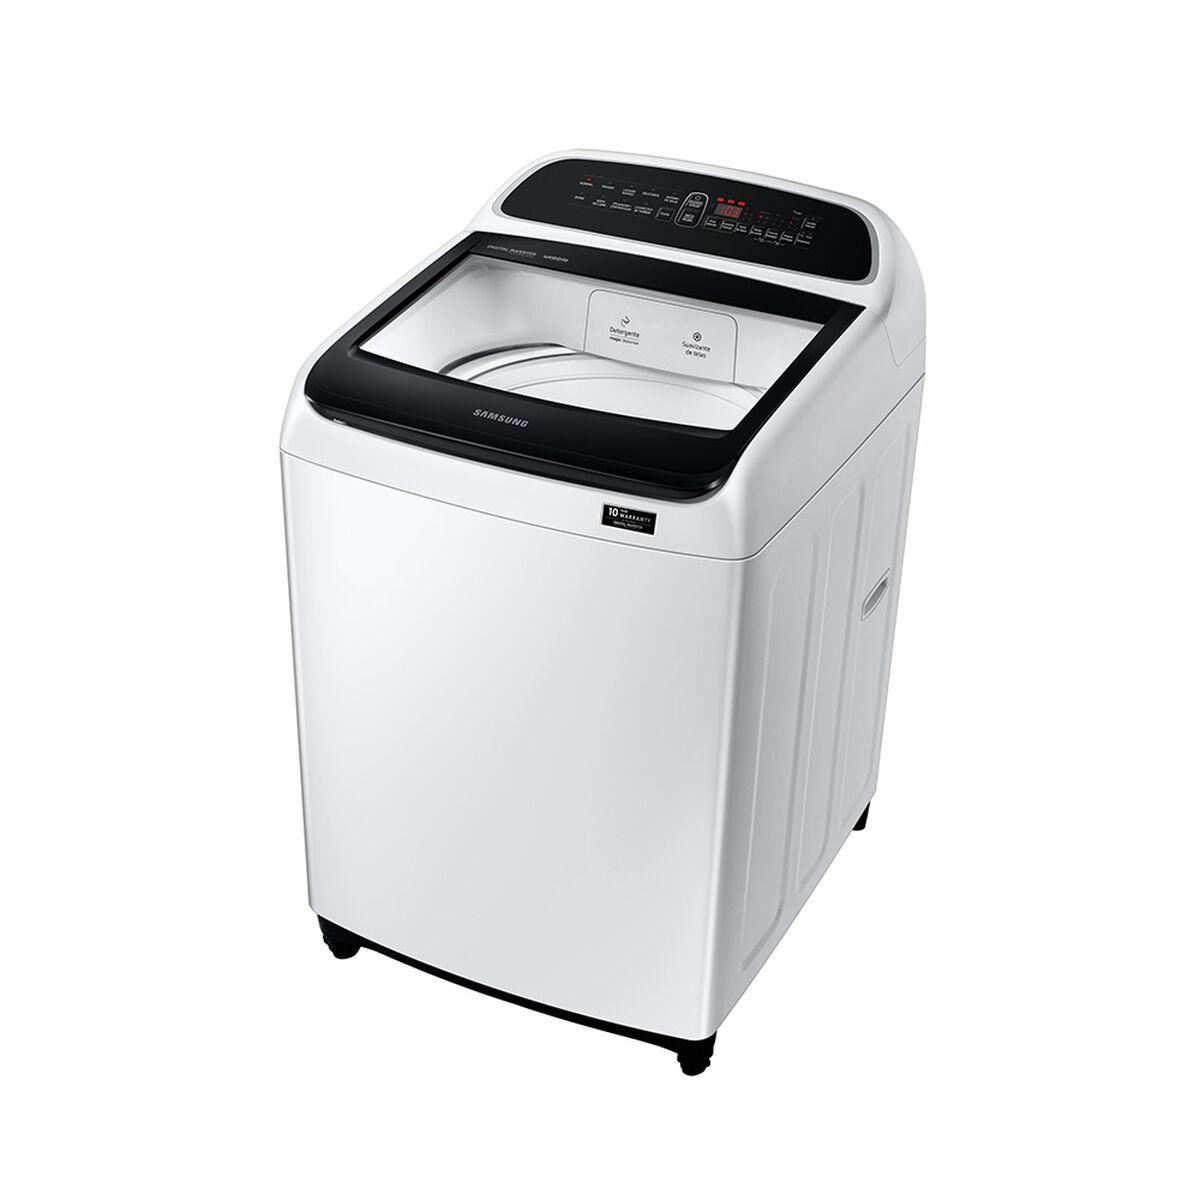 Lavadora Automática Samsung WA13T5260BW/ZS 13 kg.